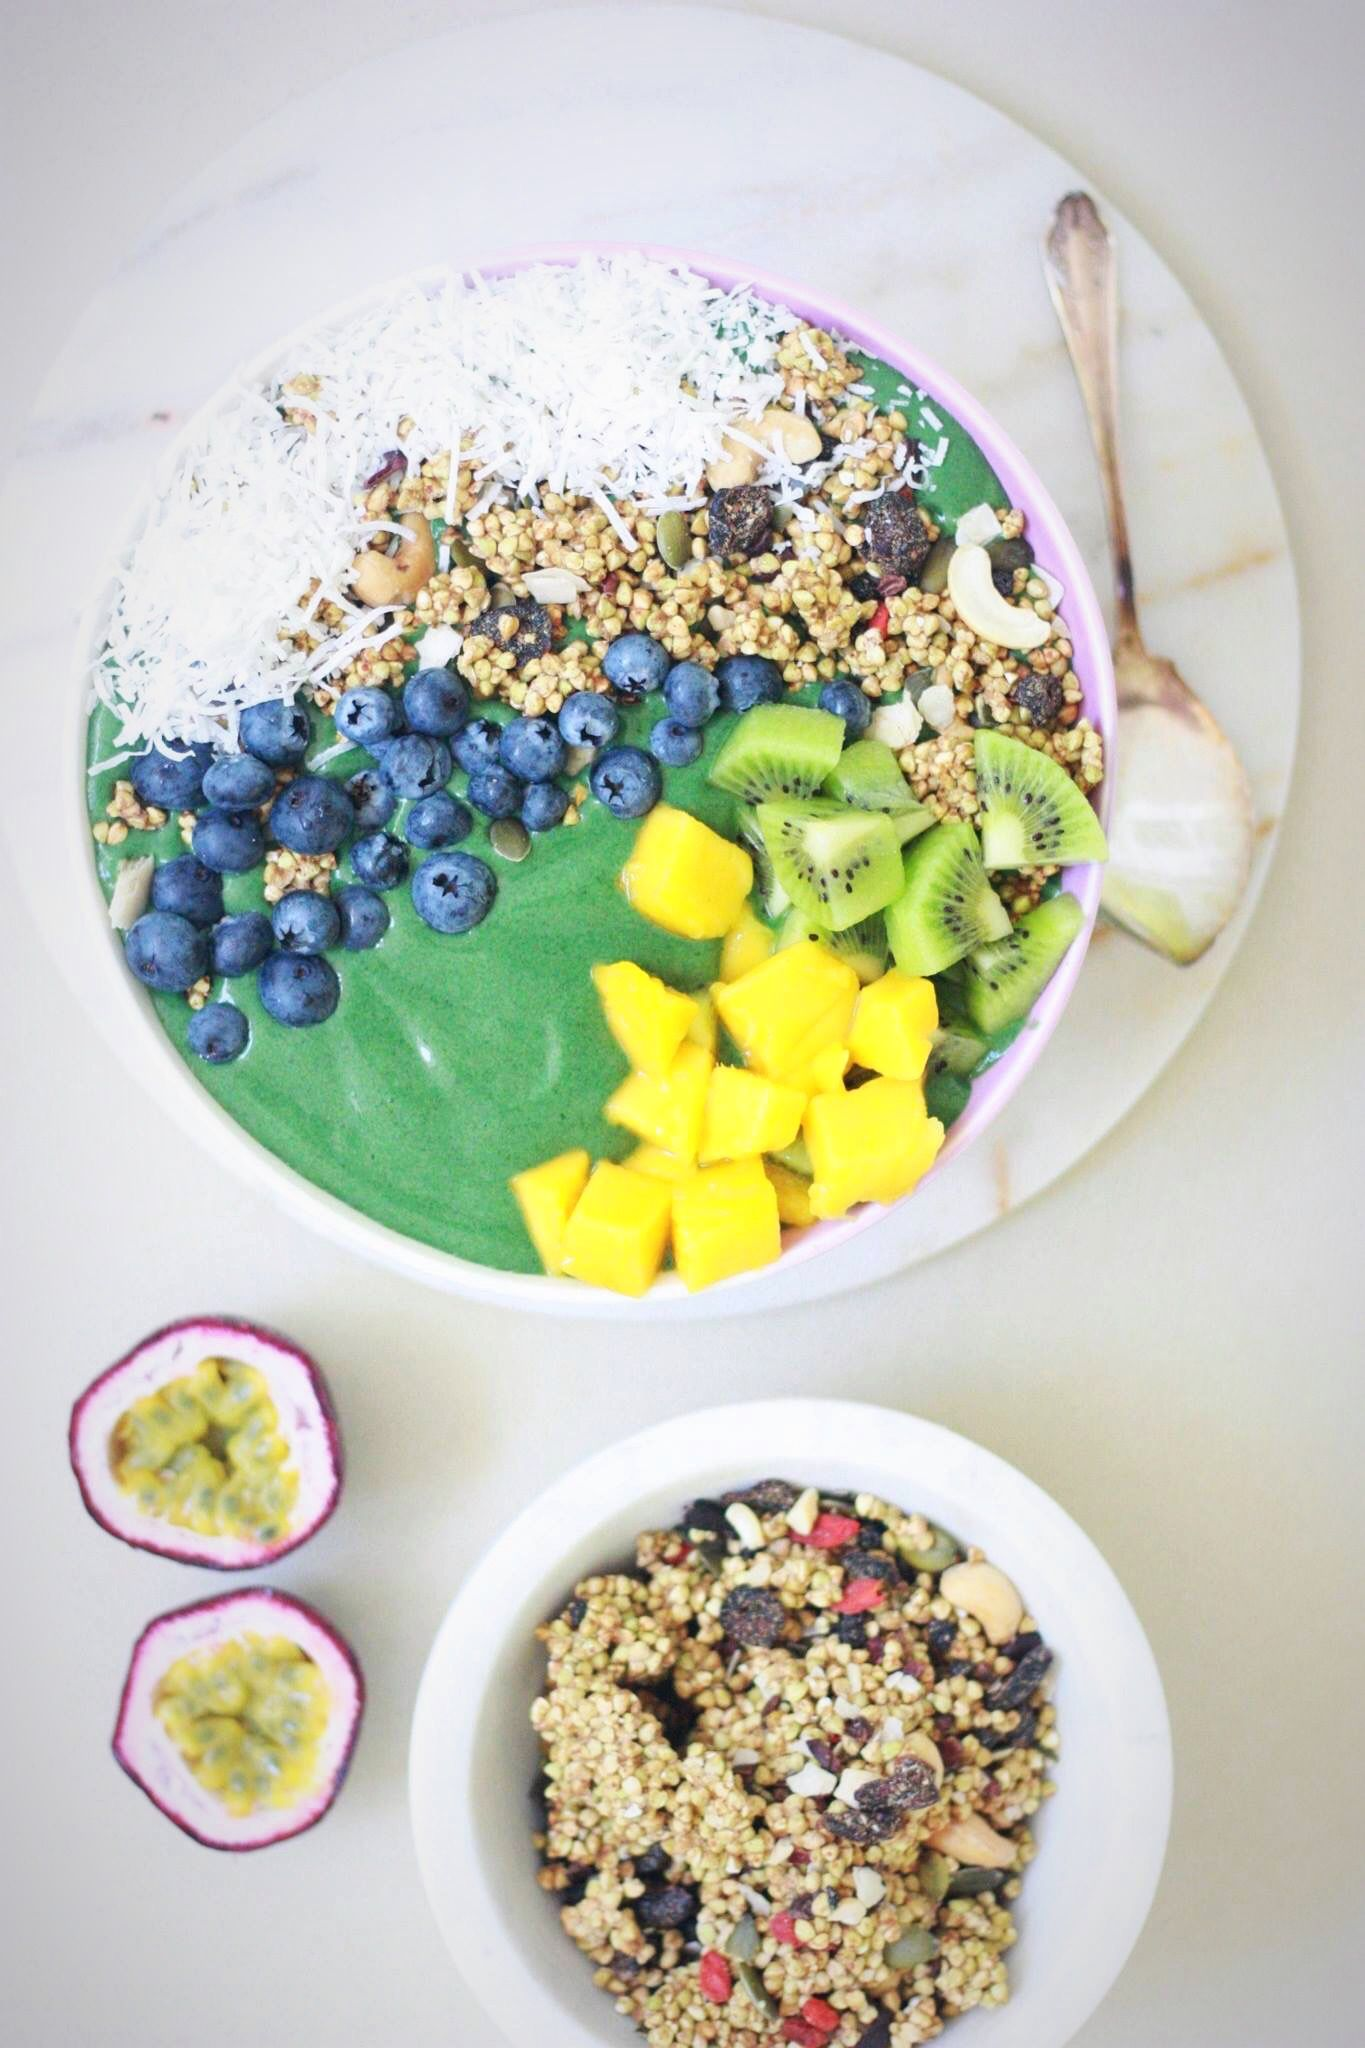 Green smoothie bowl and raw granola recipe